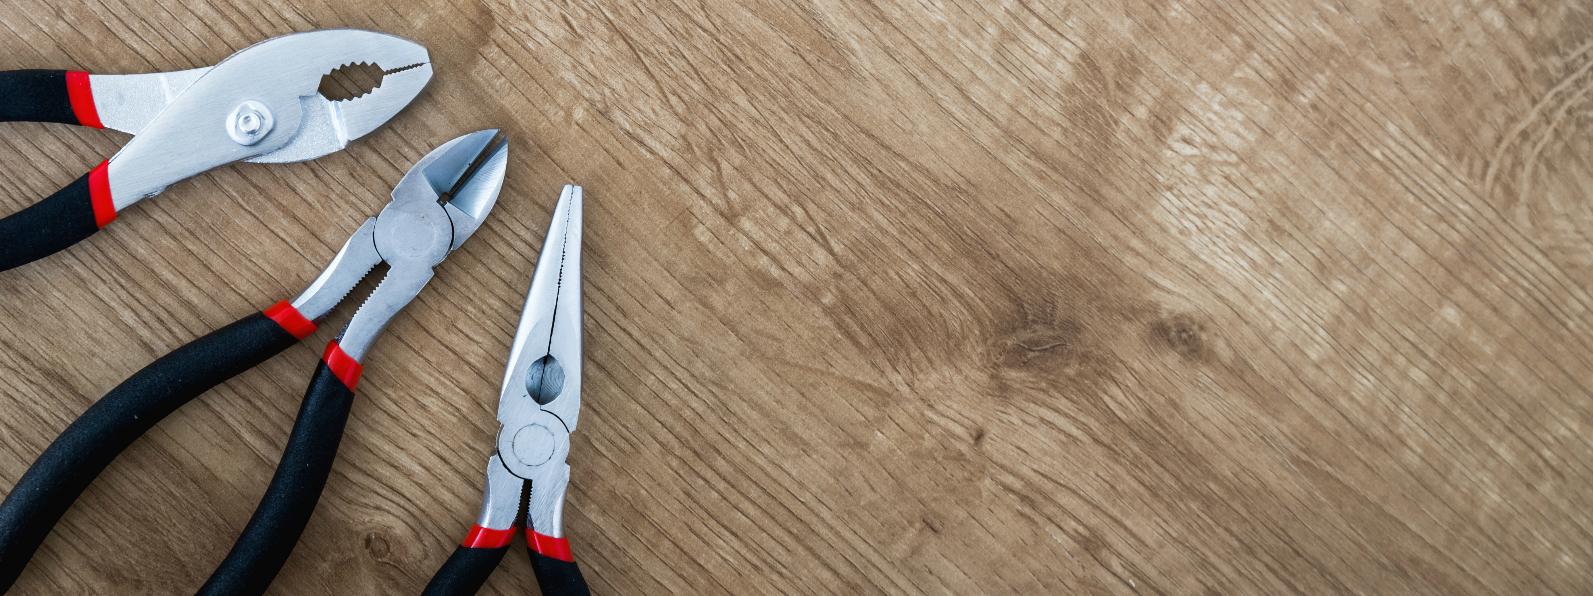 Servicing Repairs Upgrades